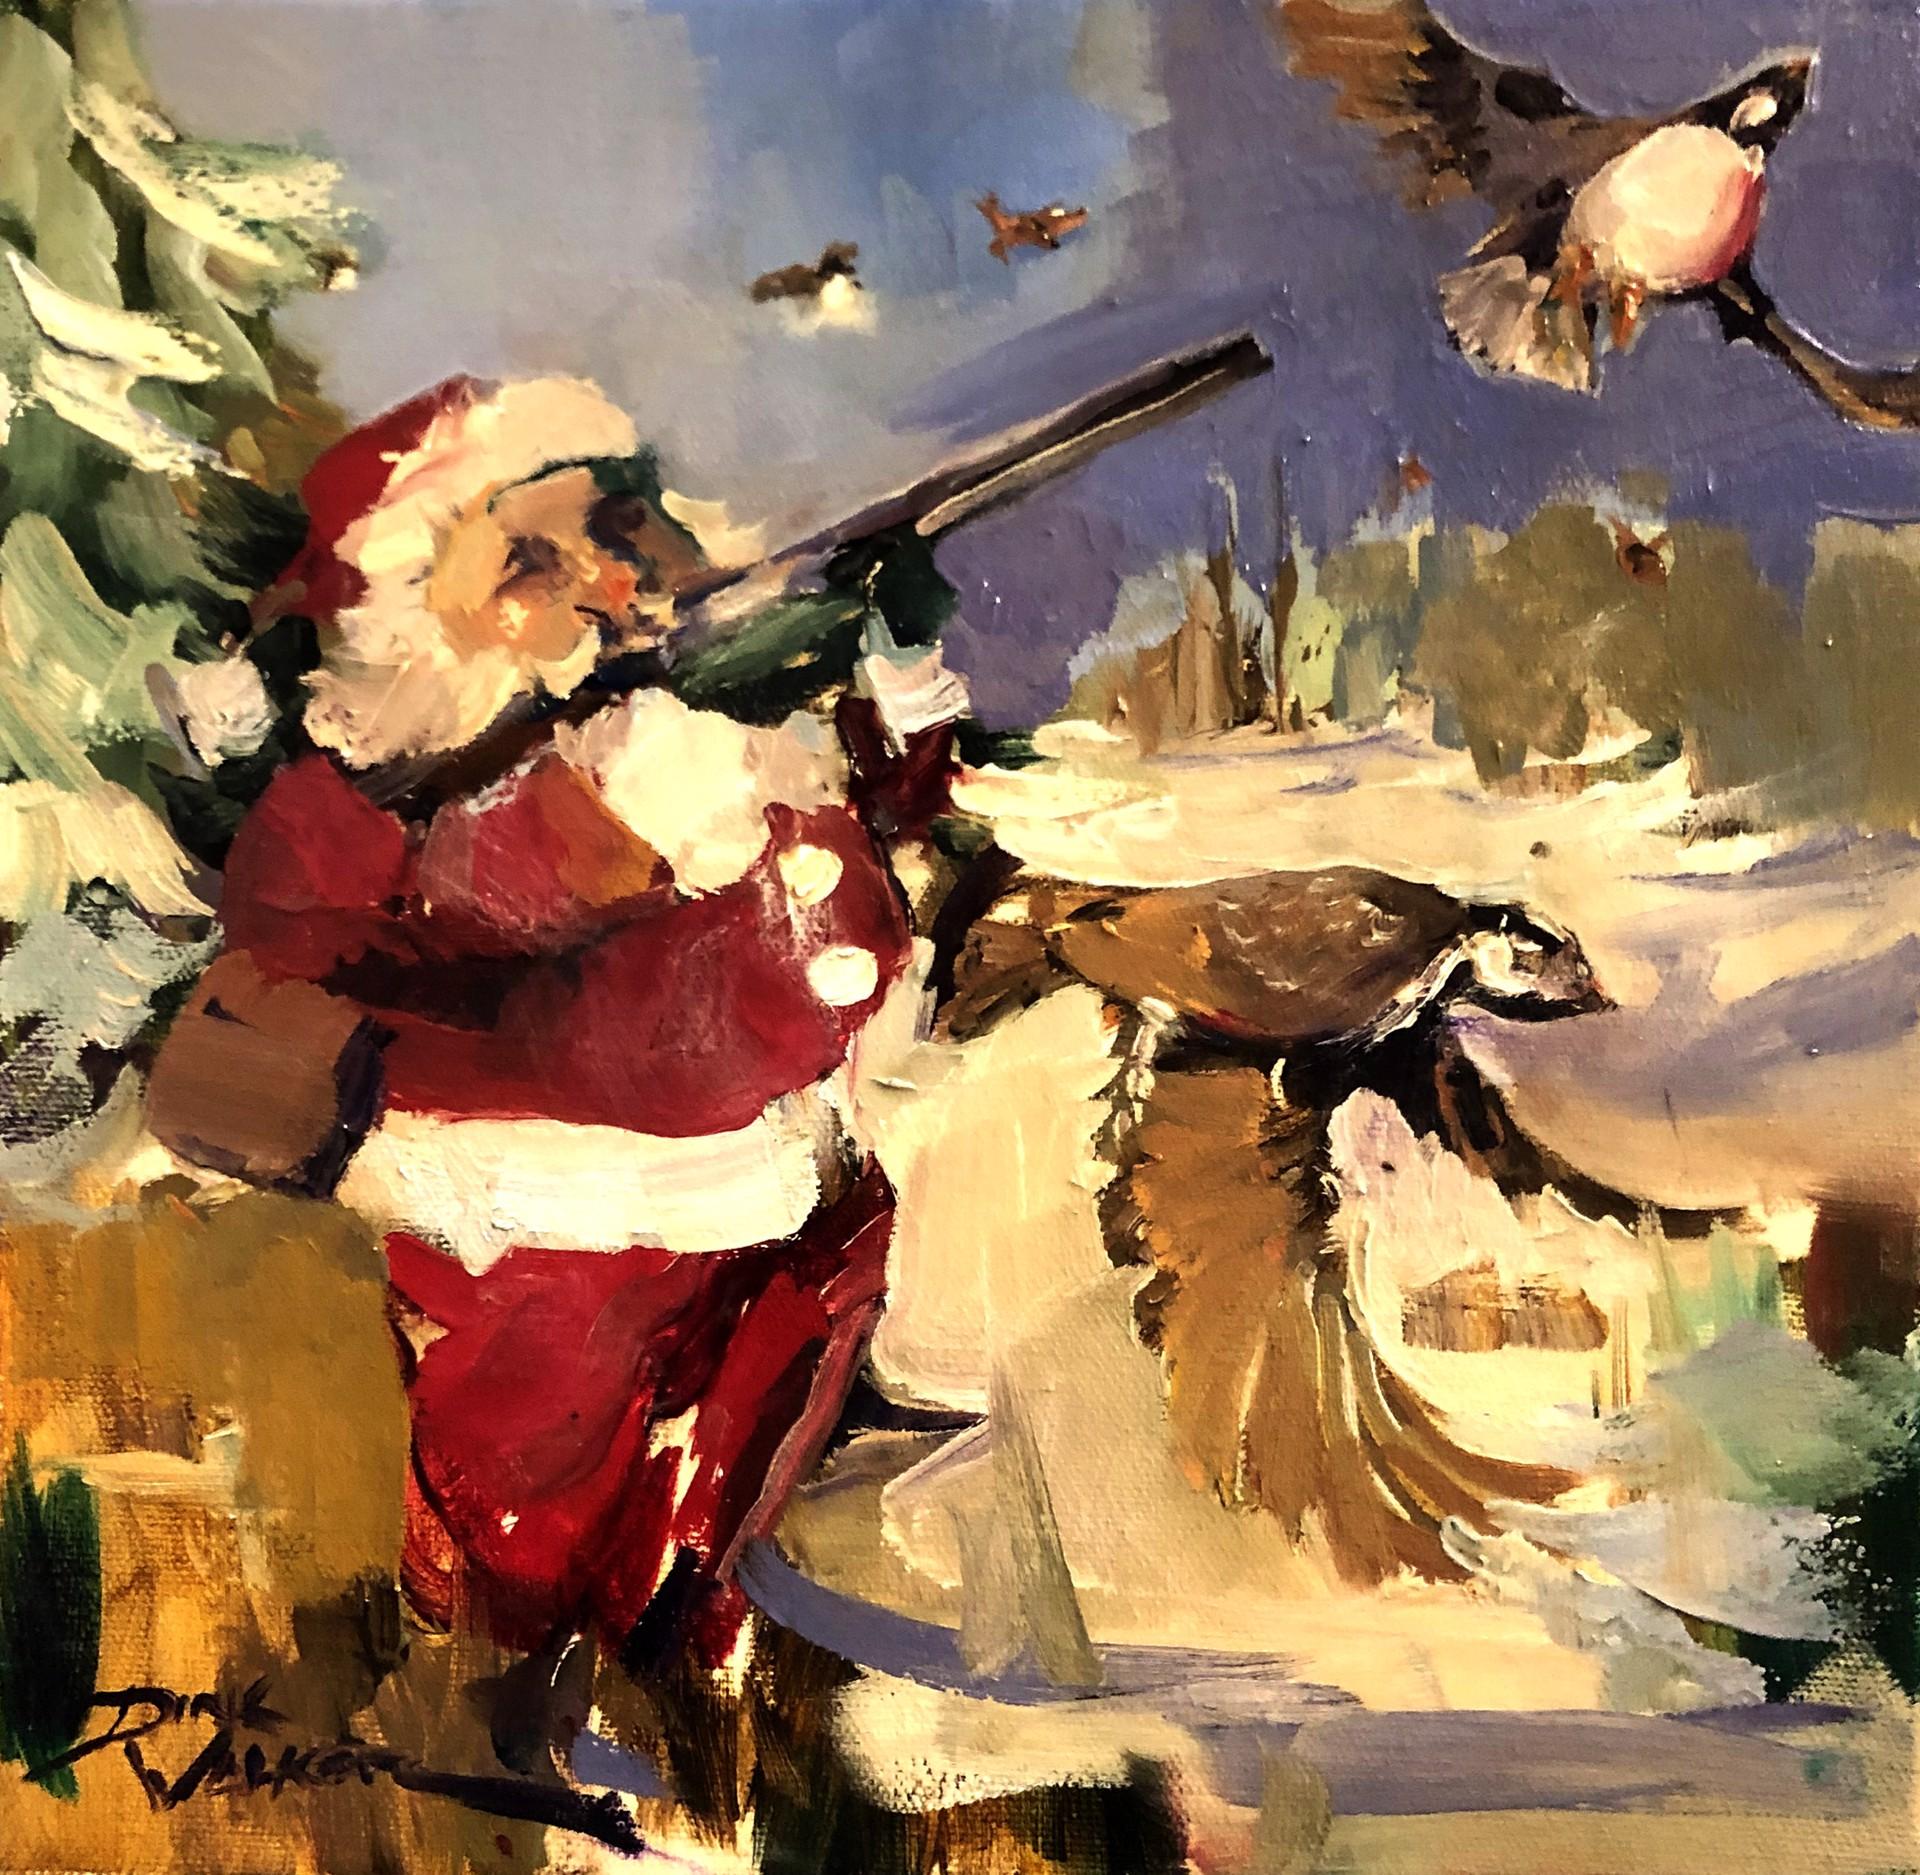 Santa on the Hunt by Dirk Walker